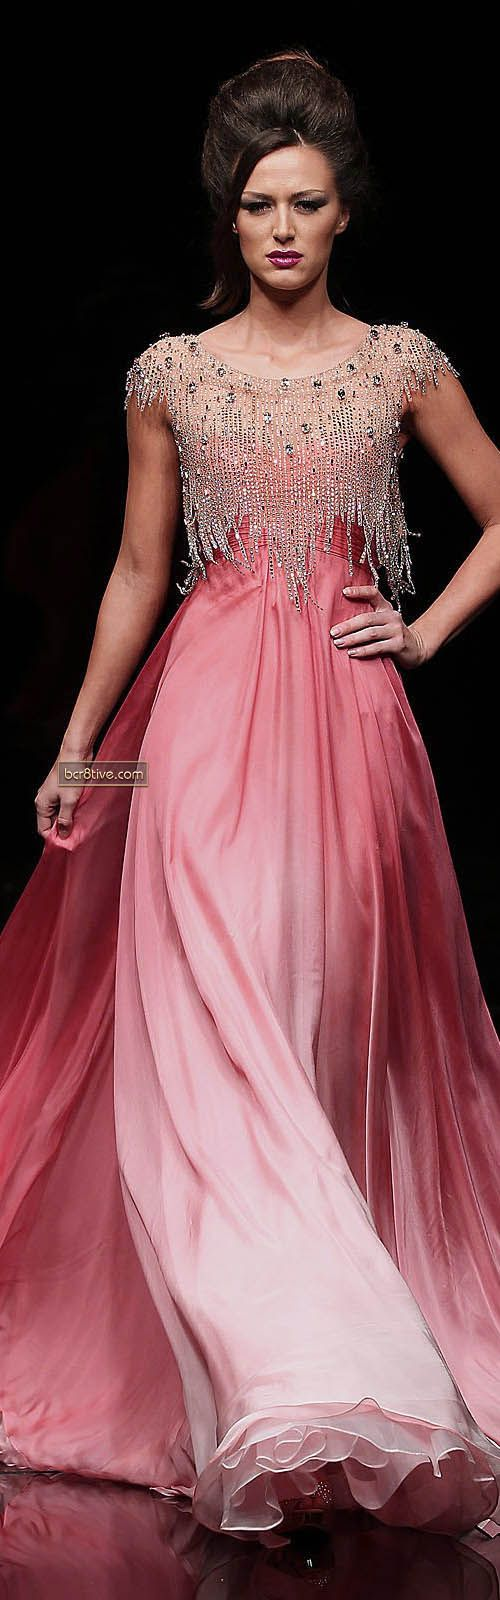 Hanna Touma Spring Summer 2012 Haute Couture | Fashion 1980-present ...